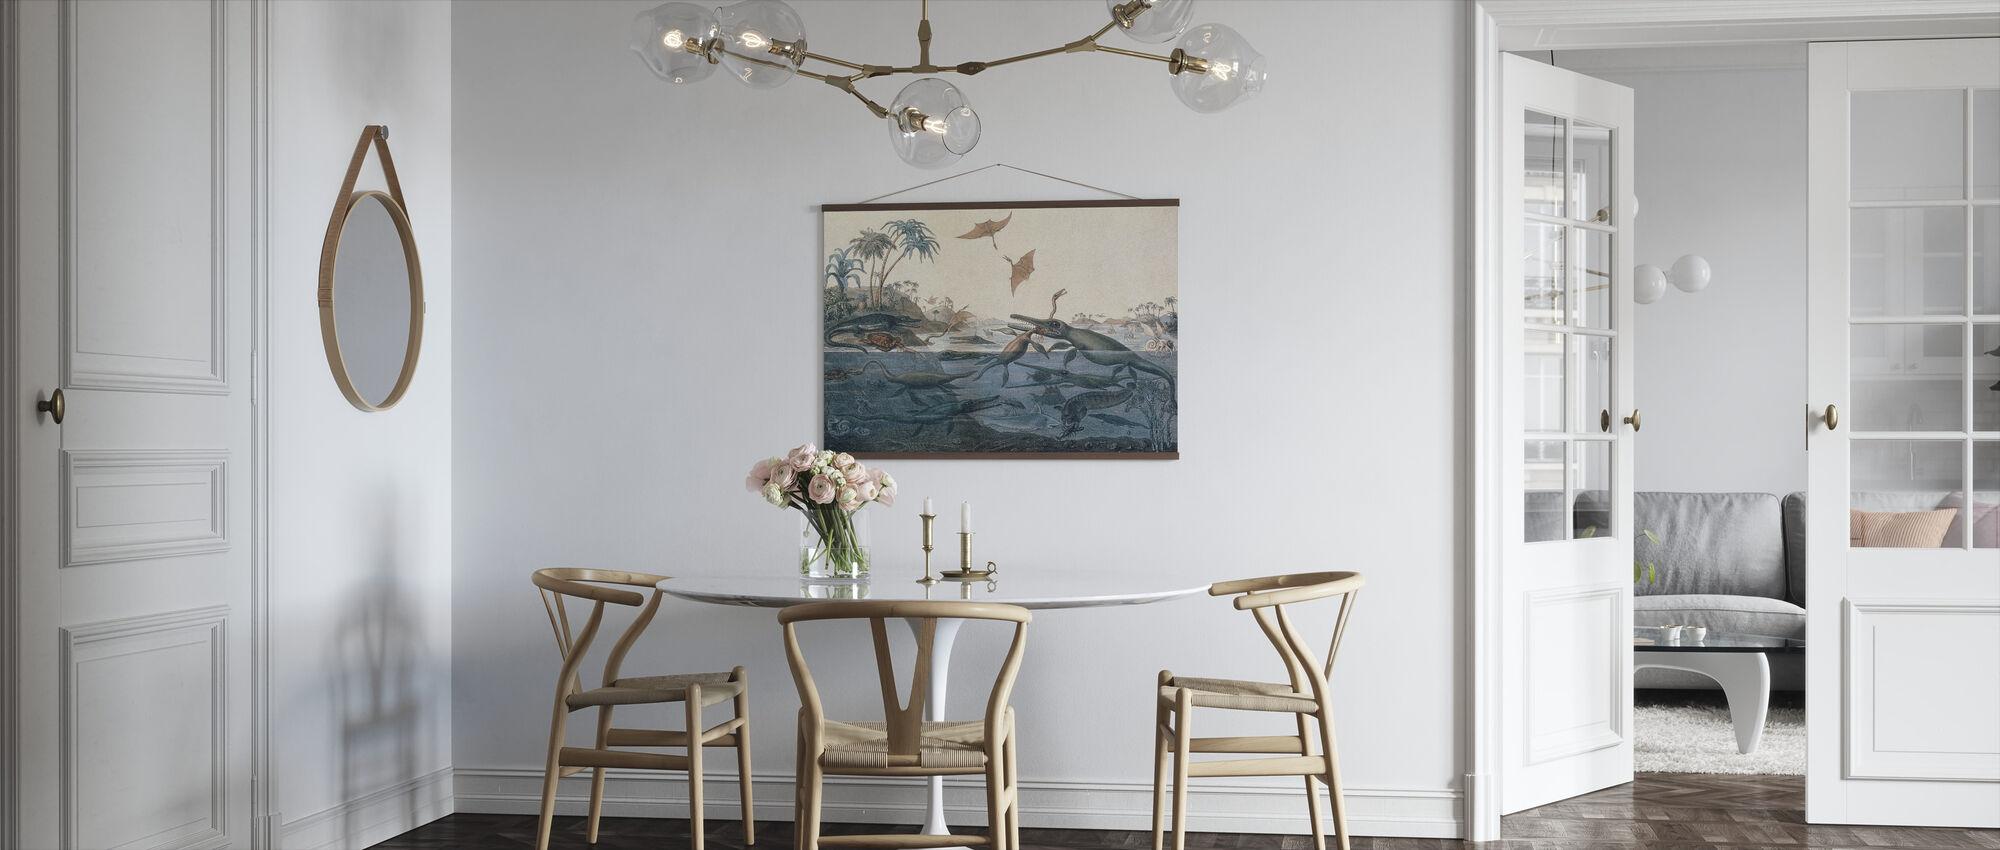 Henry De la Beche - Duria Antiquior - Poster - Kitchen